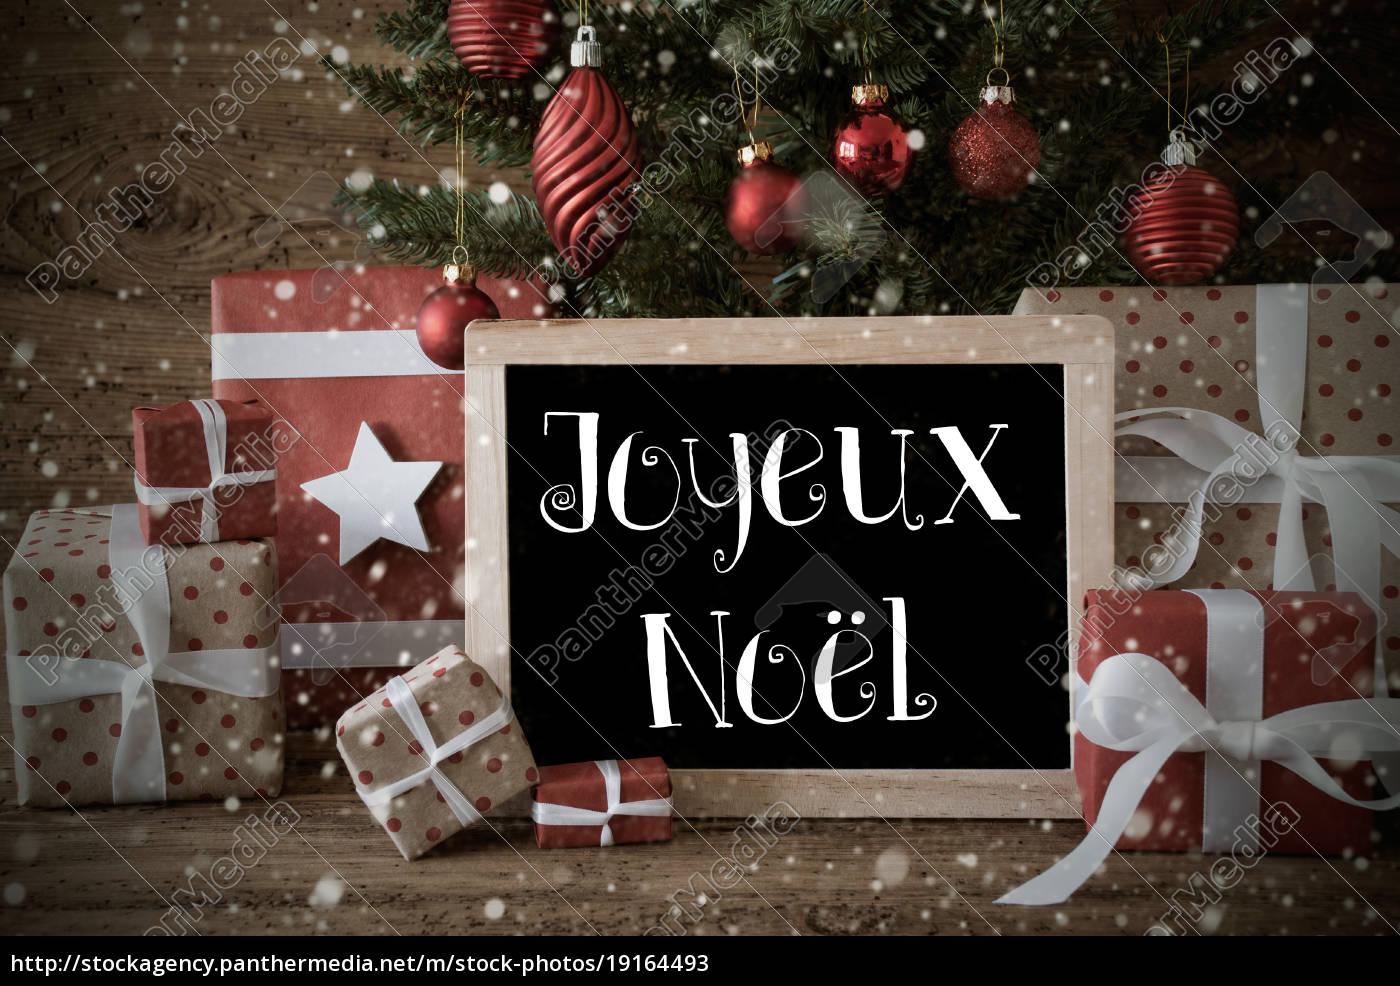 nostalgic, tree, , joyeux, noel, means, merry - 19164493